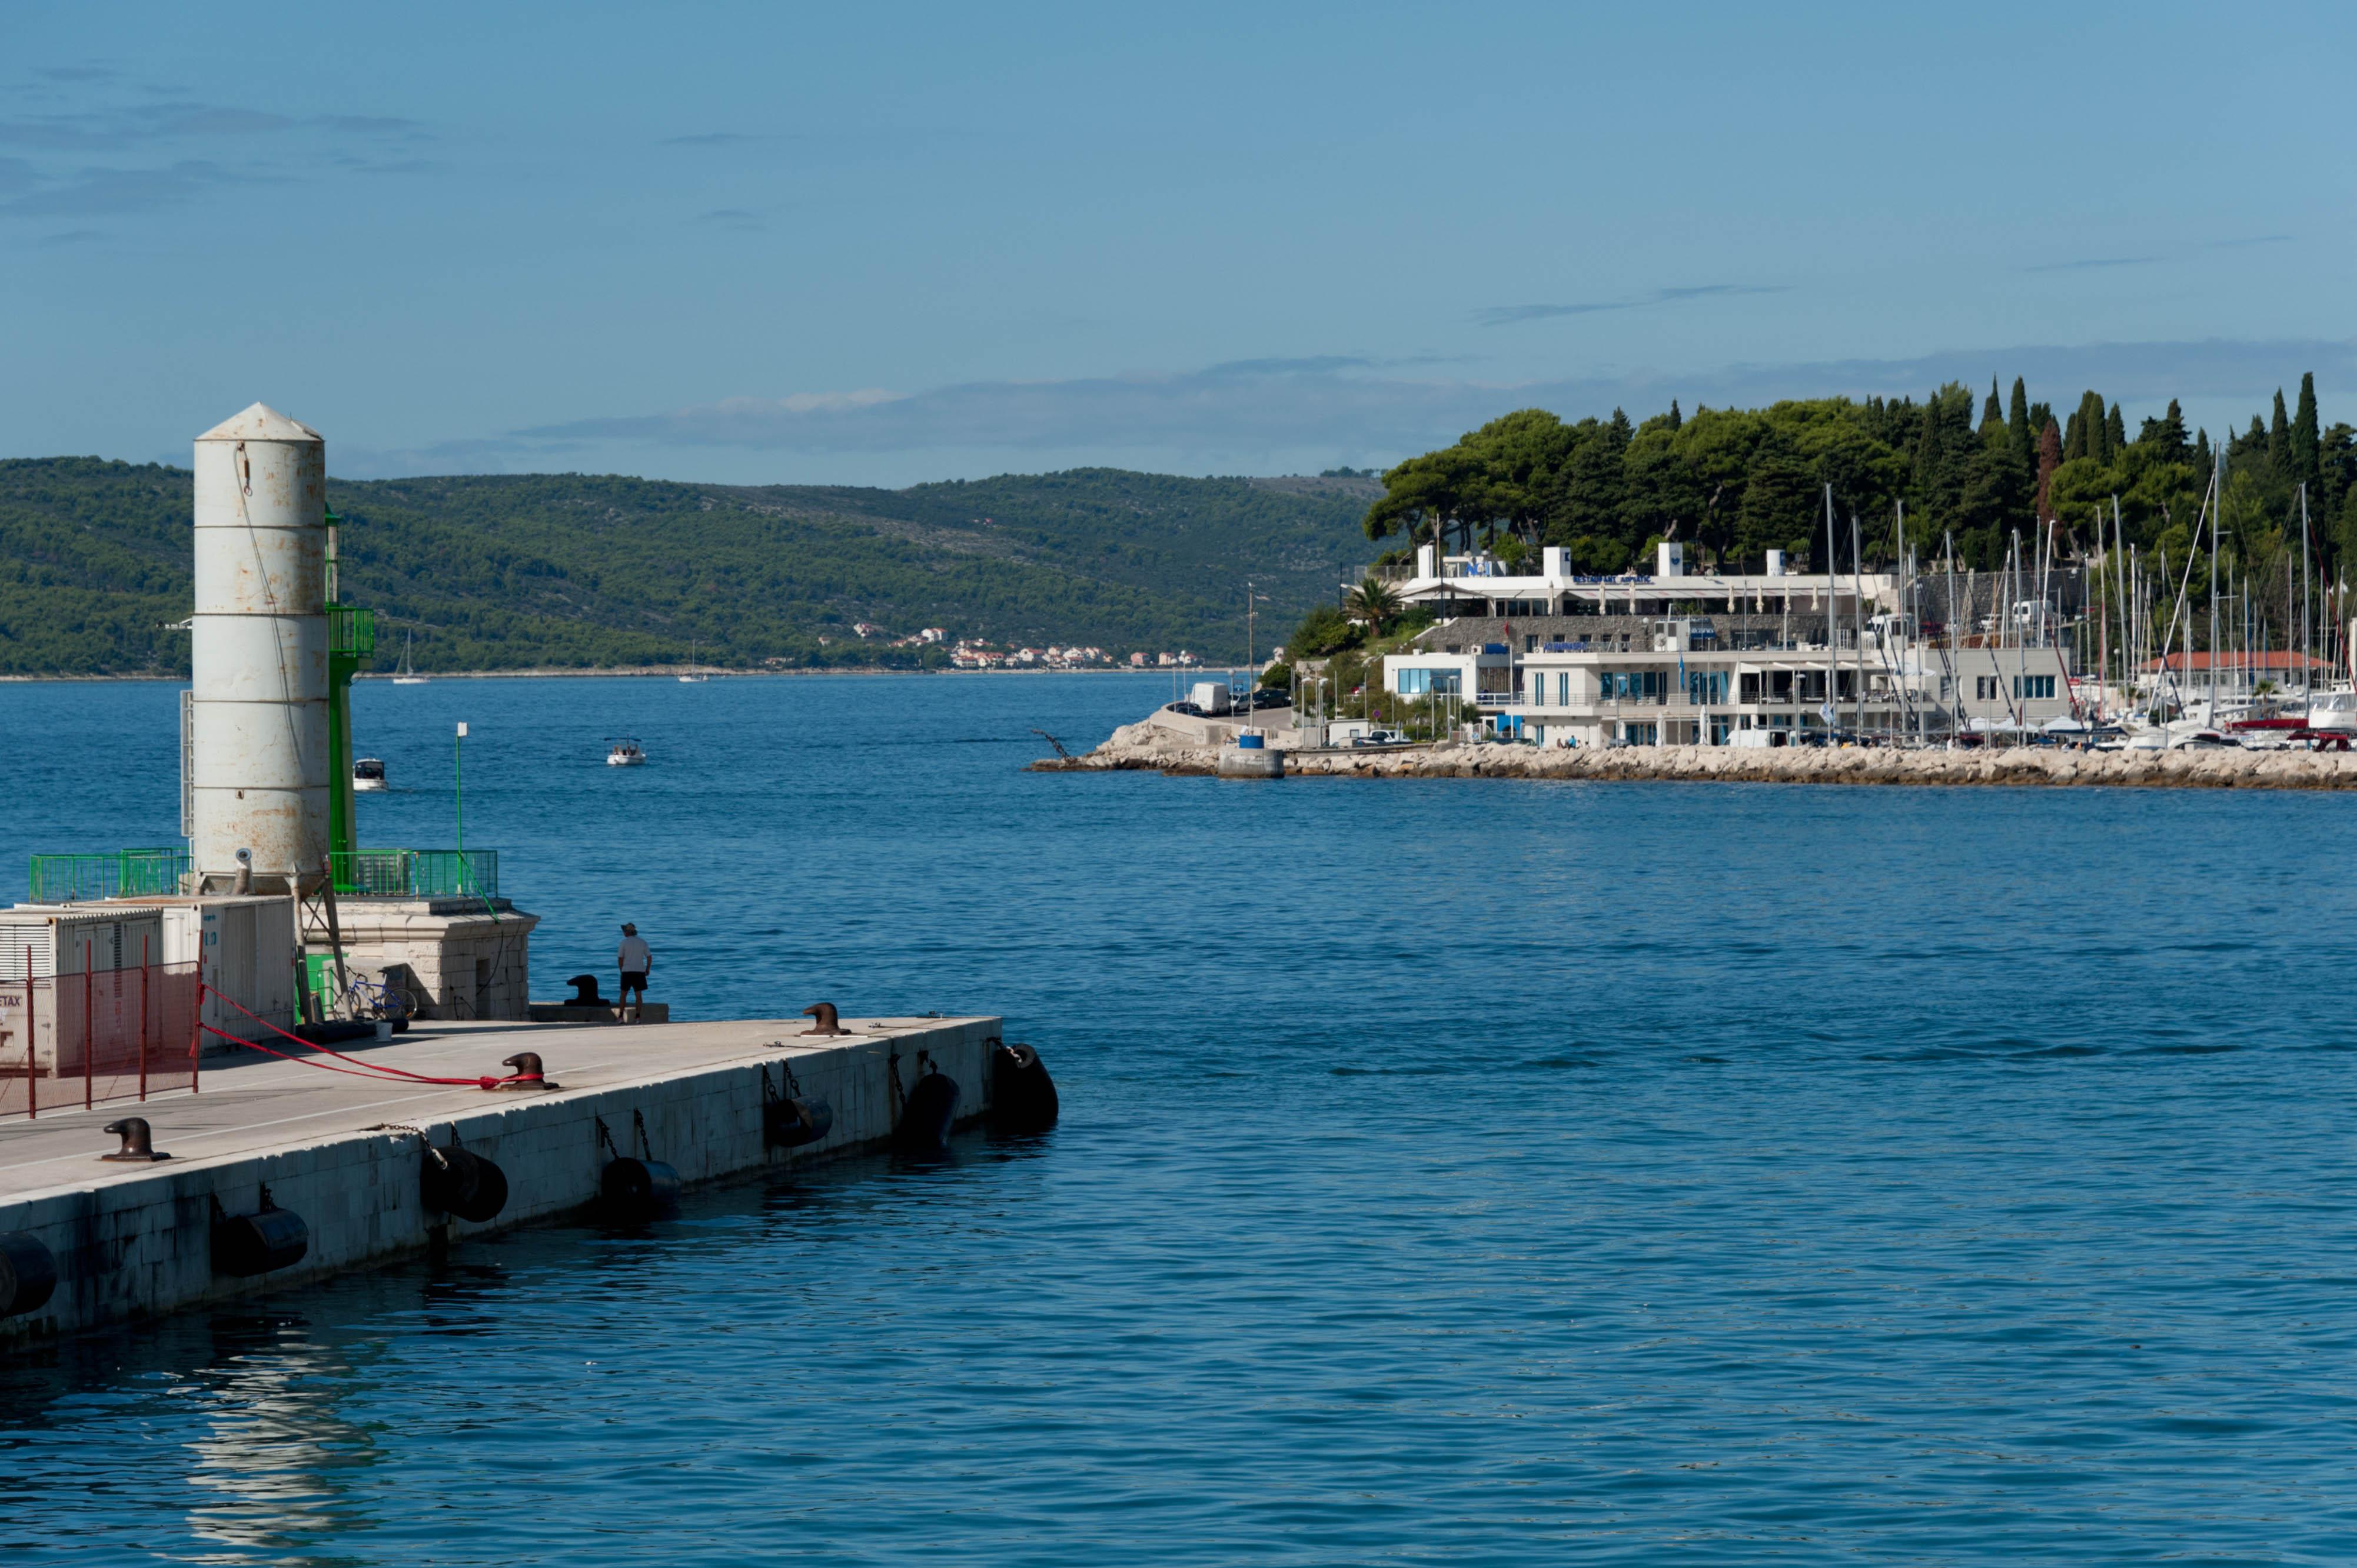 9813-Split (Dalmatie centrale)